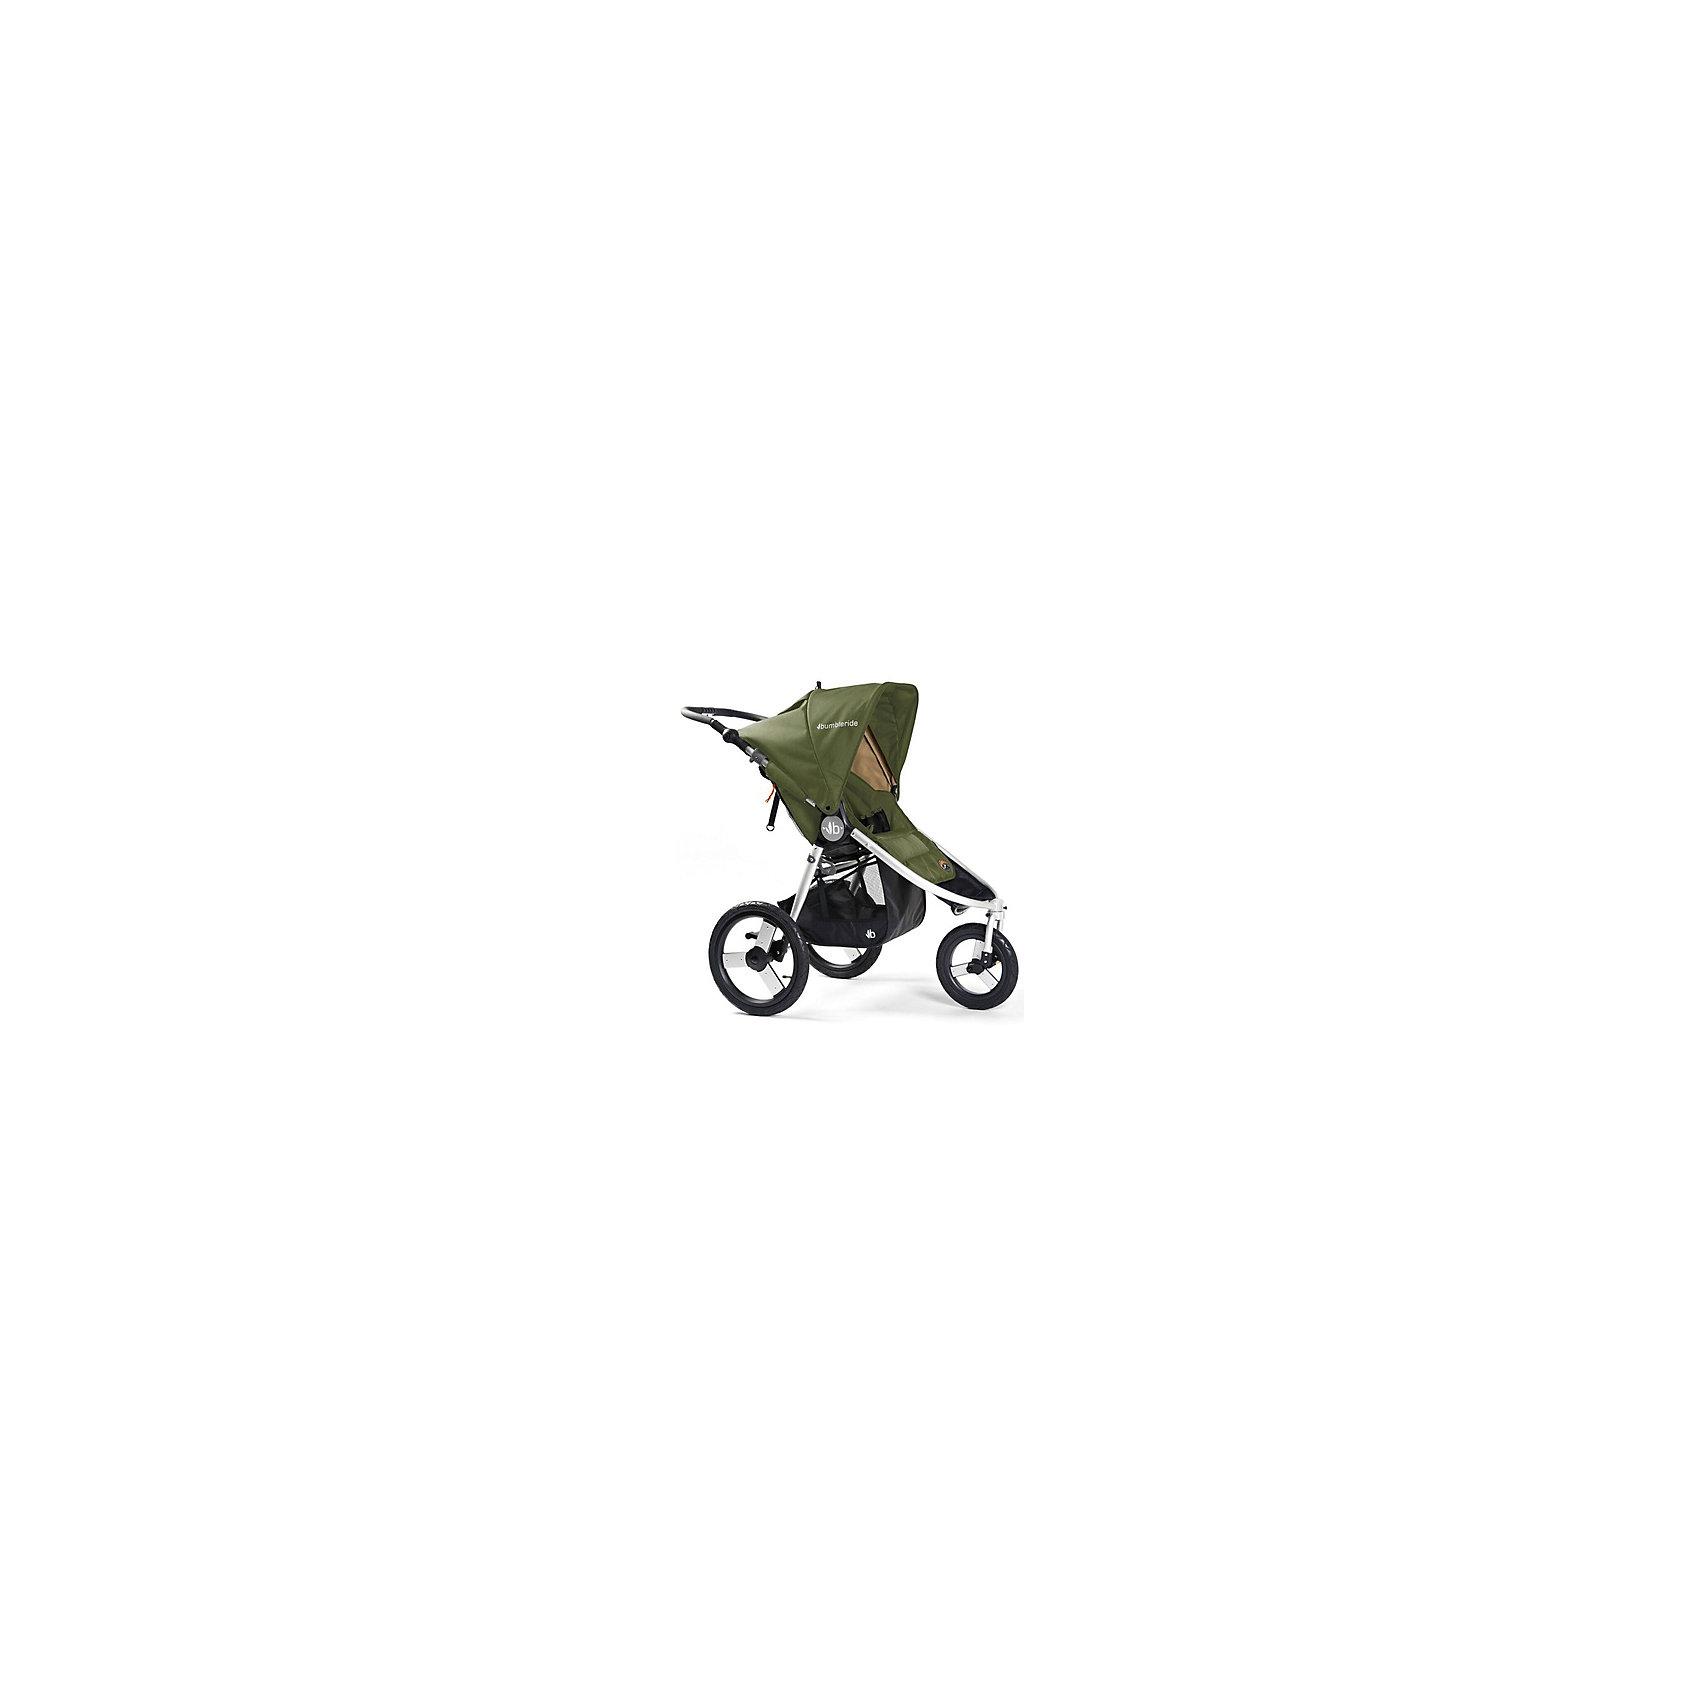 Bumbleride Прогулочная коляска Speed, Bumbleride , camp green